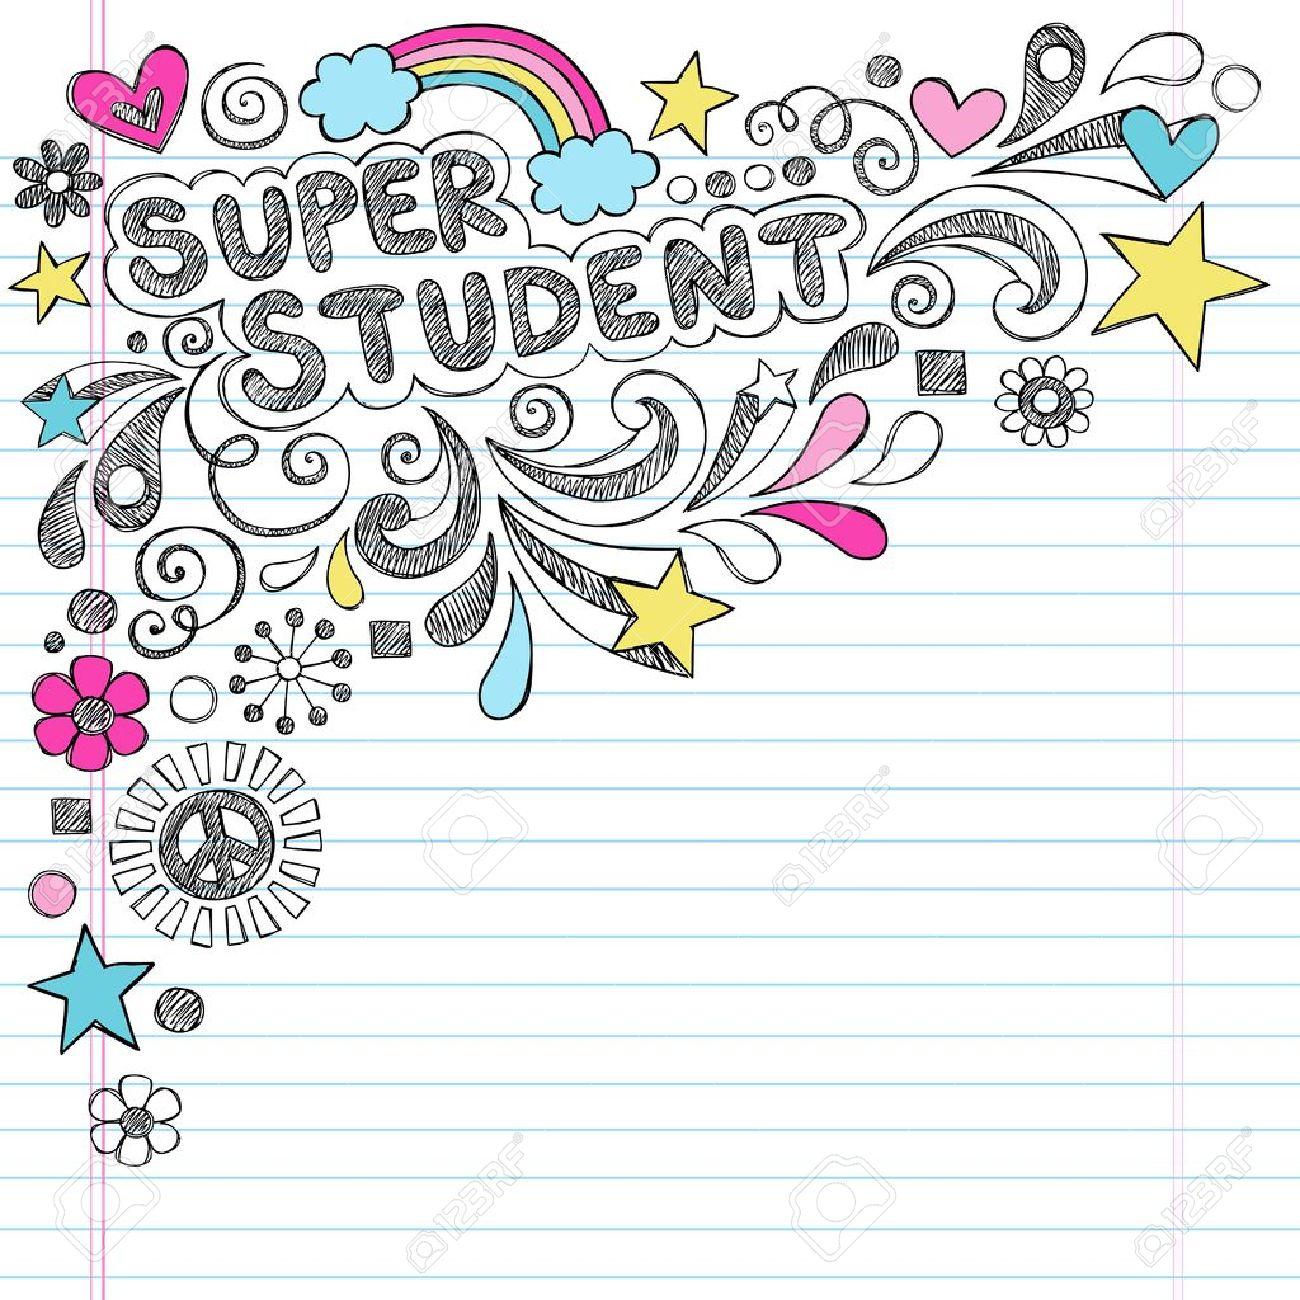 Super Student Back to School Rainbow Notebook Doodles Stock Vector - 21863068